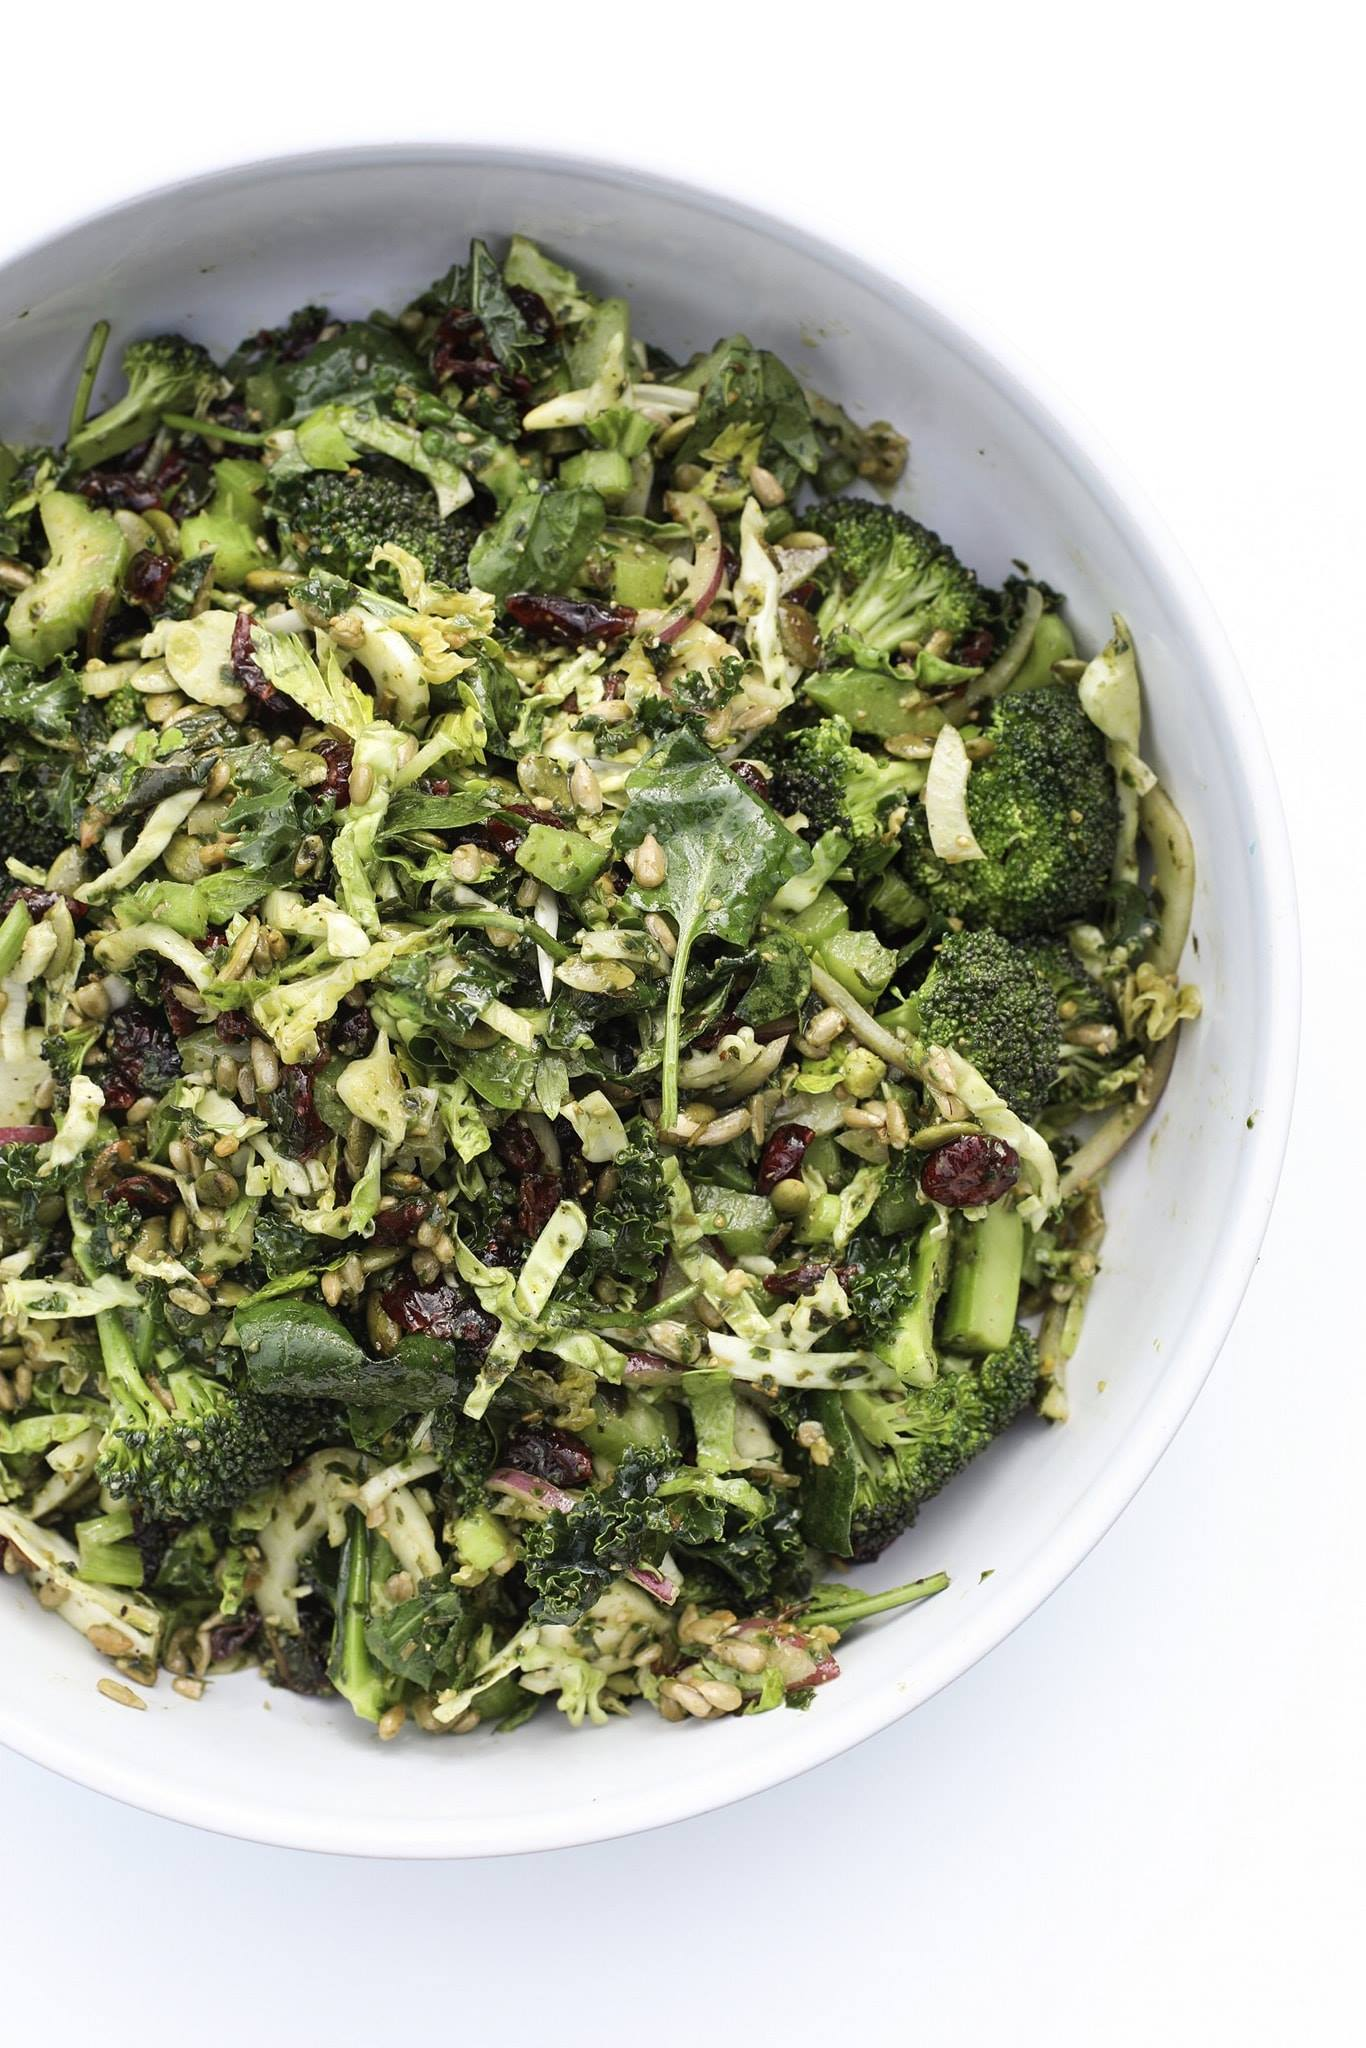 Broccoli salad from Sunday Cantina